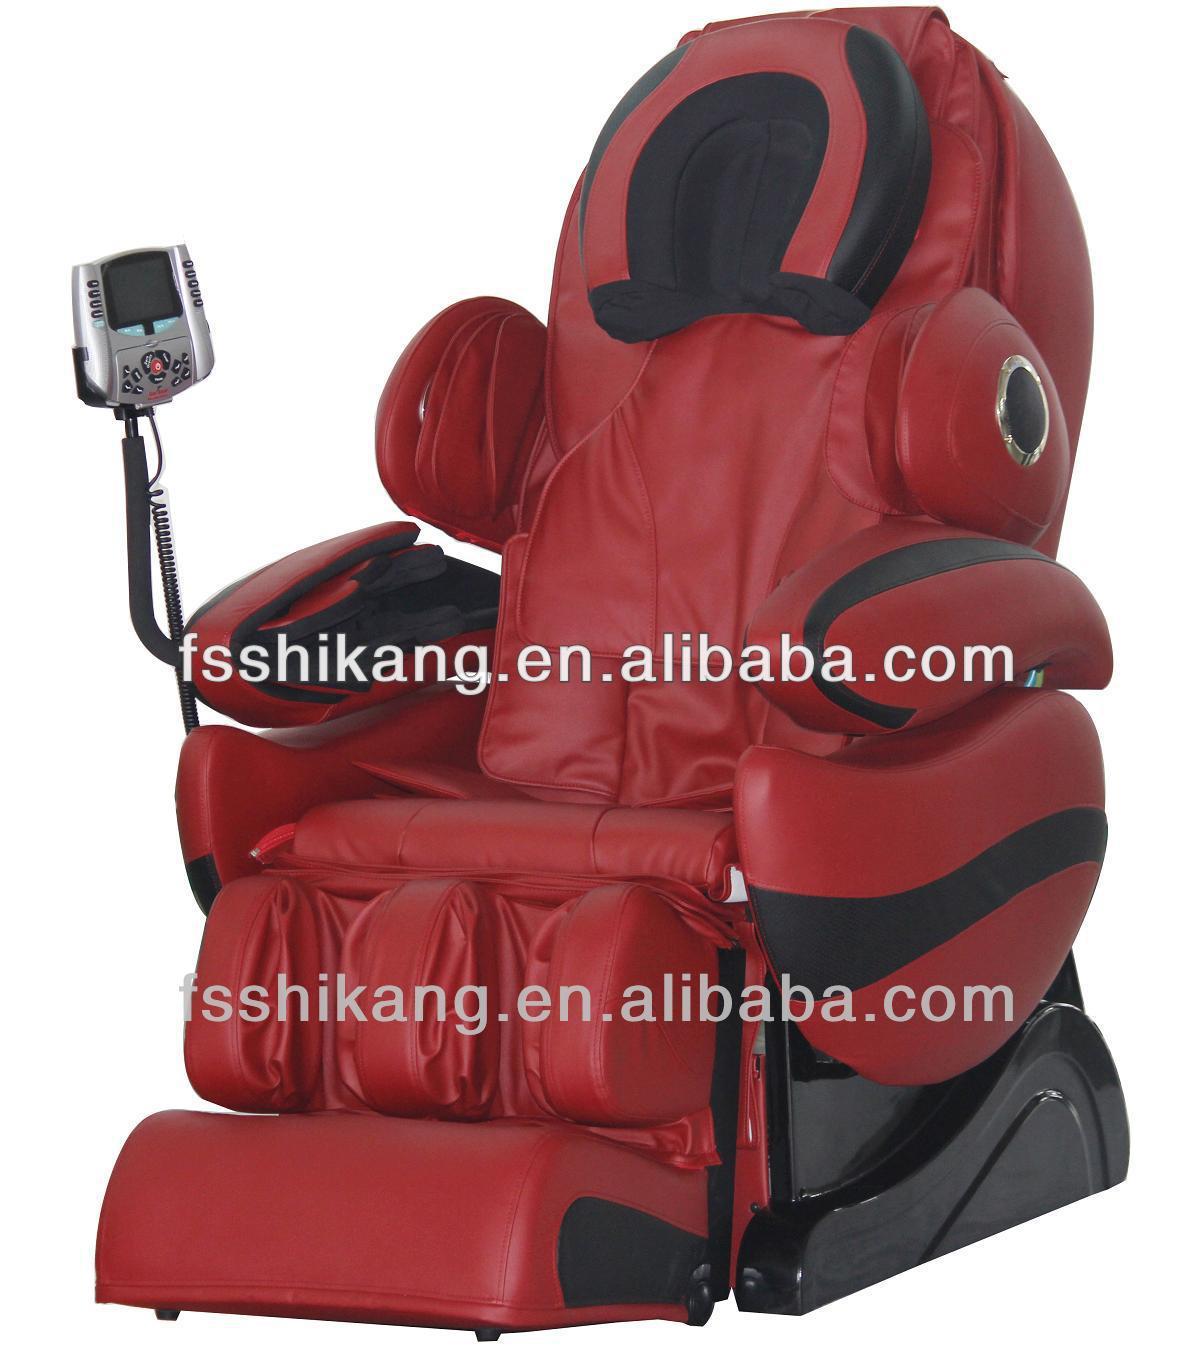 Osim massage chair price - China Osim Massage Chairs China Osim Massage Chairs Manufacturers And Suppliers On Alibaba Com